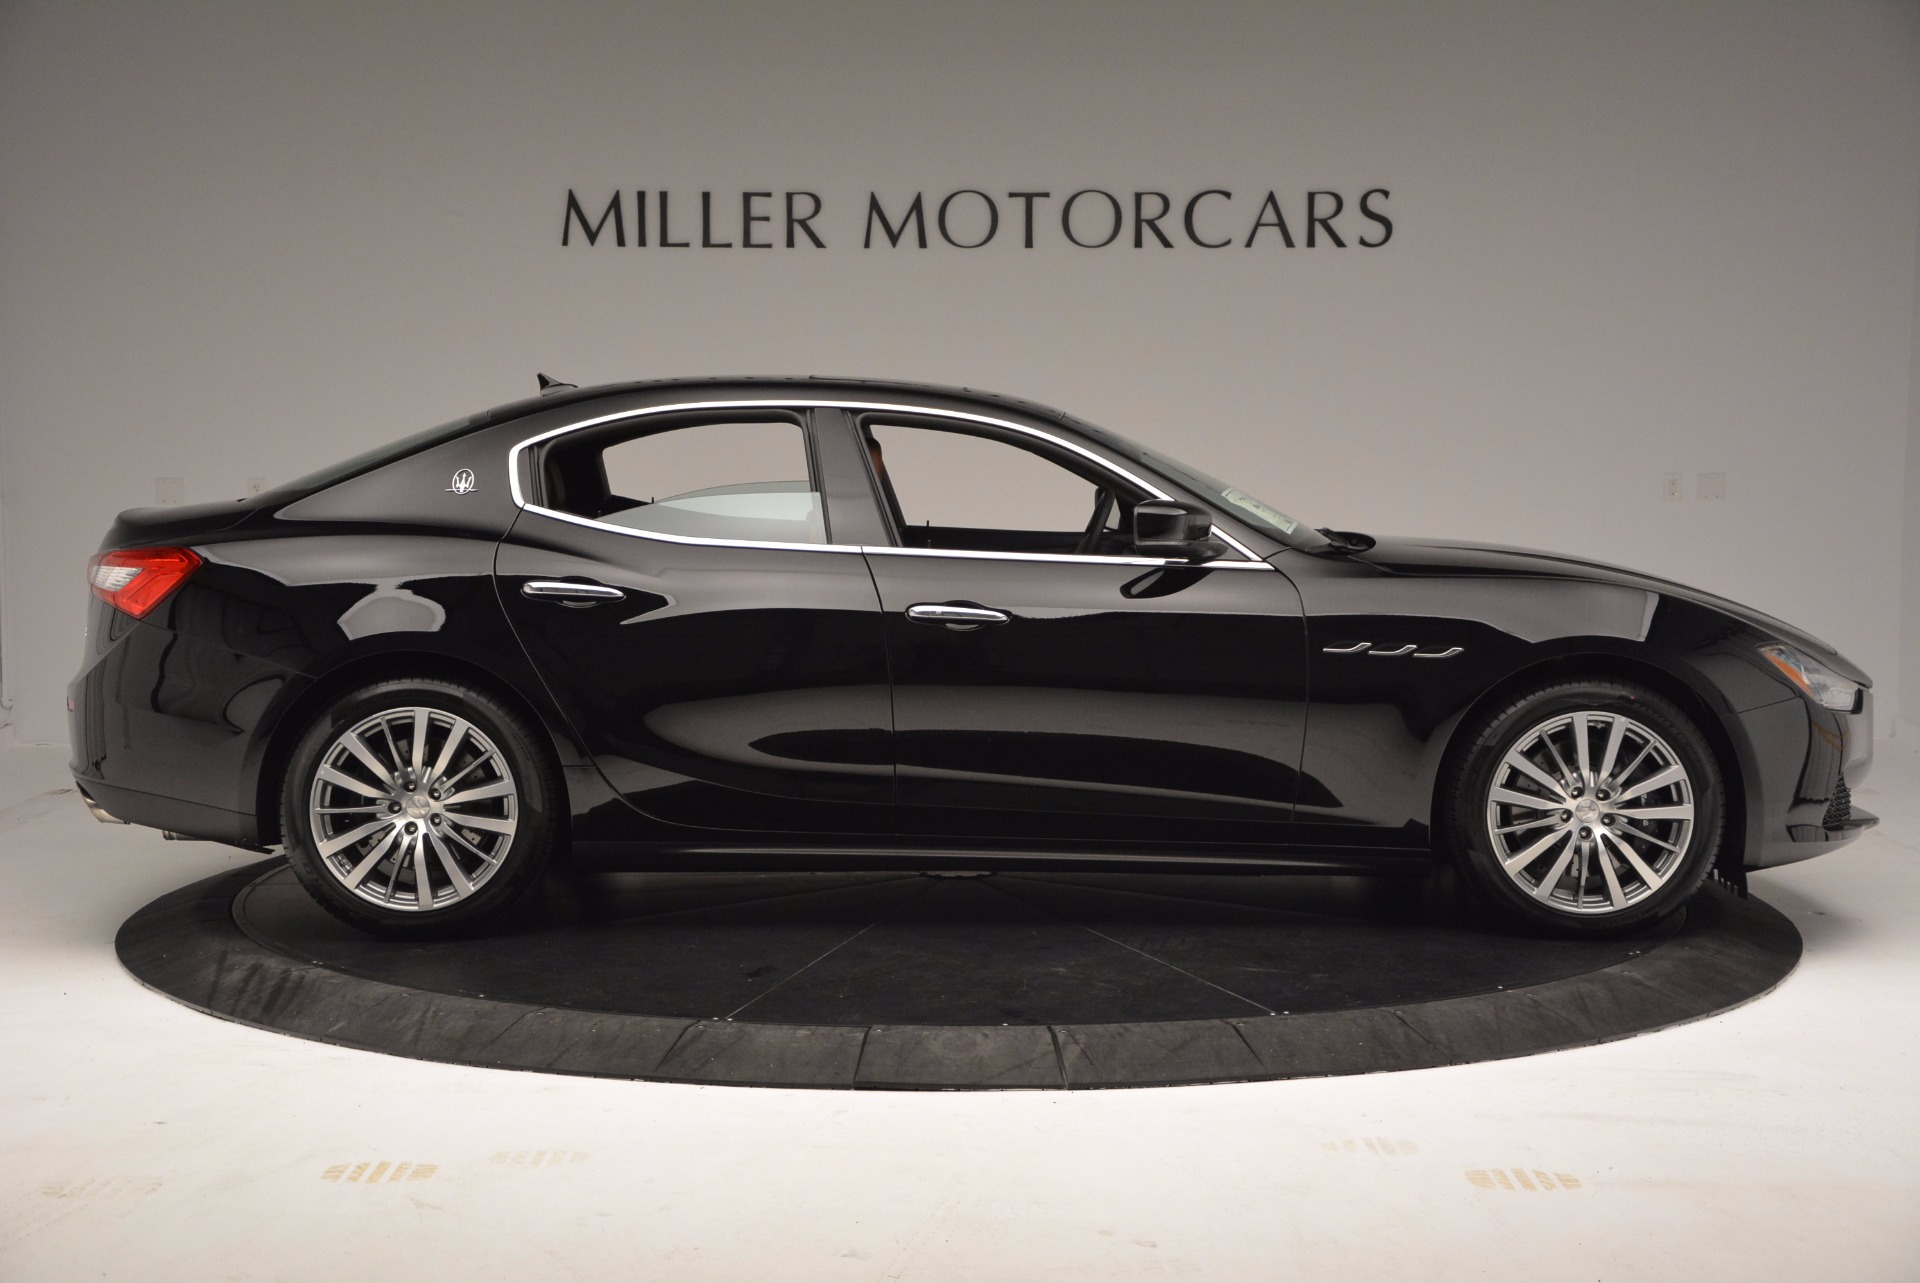 New 2017 Maserati Ghibli S Q4 EX-LOANER For Sale In Westport, CT 1115_p9